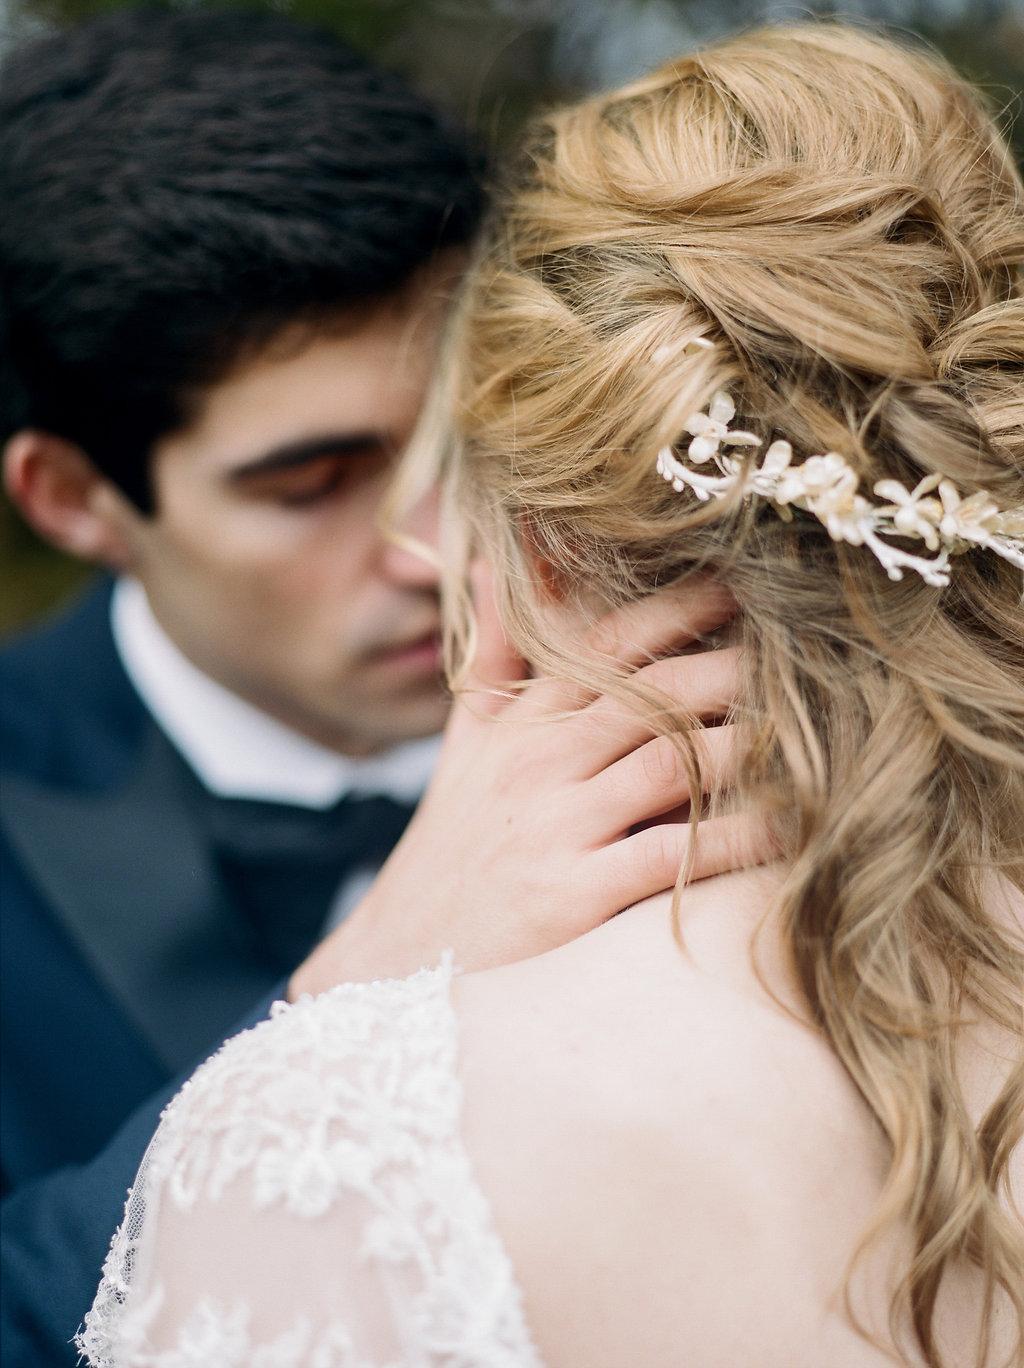 bridal hair accessories - photo by Lissa Ryan Photography https://ruffledblog.com/modern-romantic-wedding-ideas-with-family-heirlooms